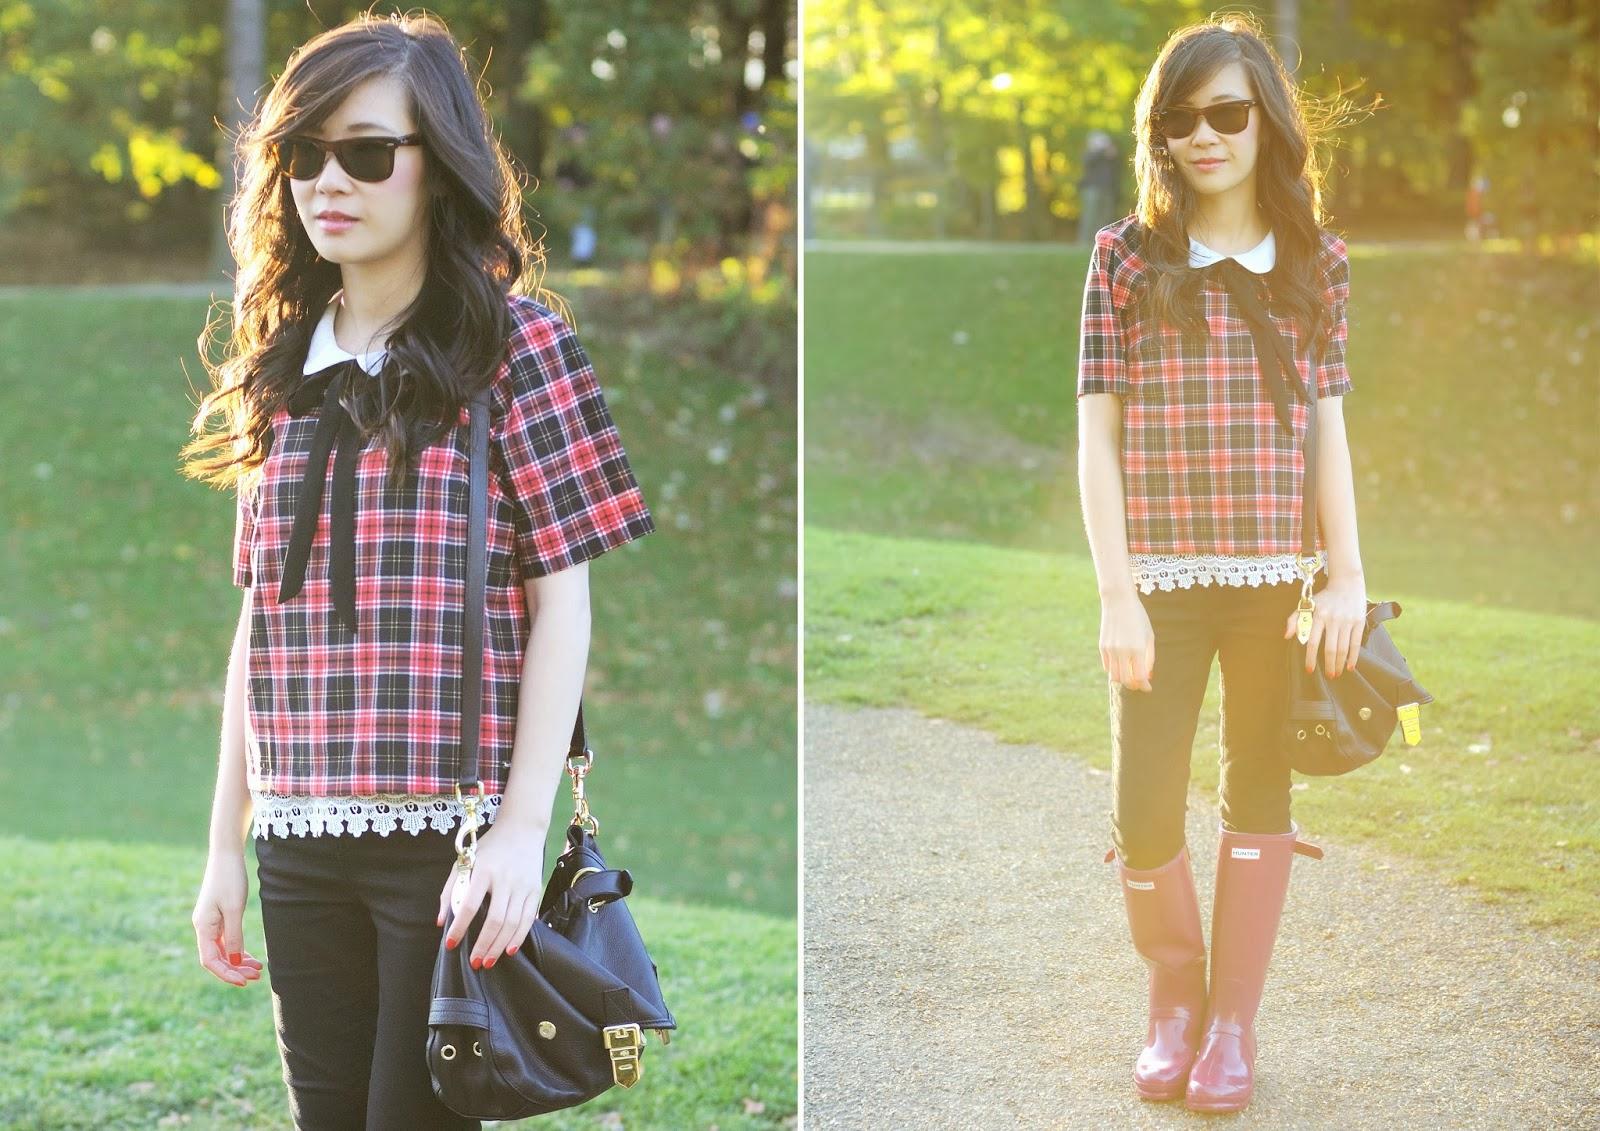 How to style tartan, fashion blogger, red tartan top